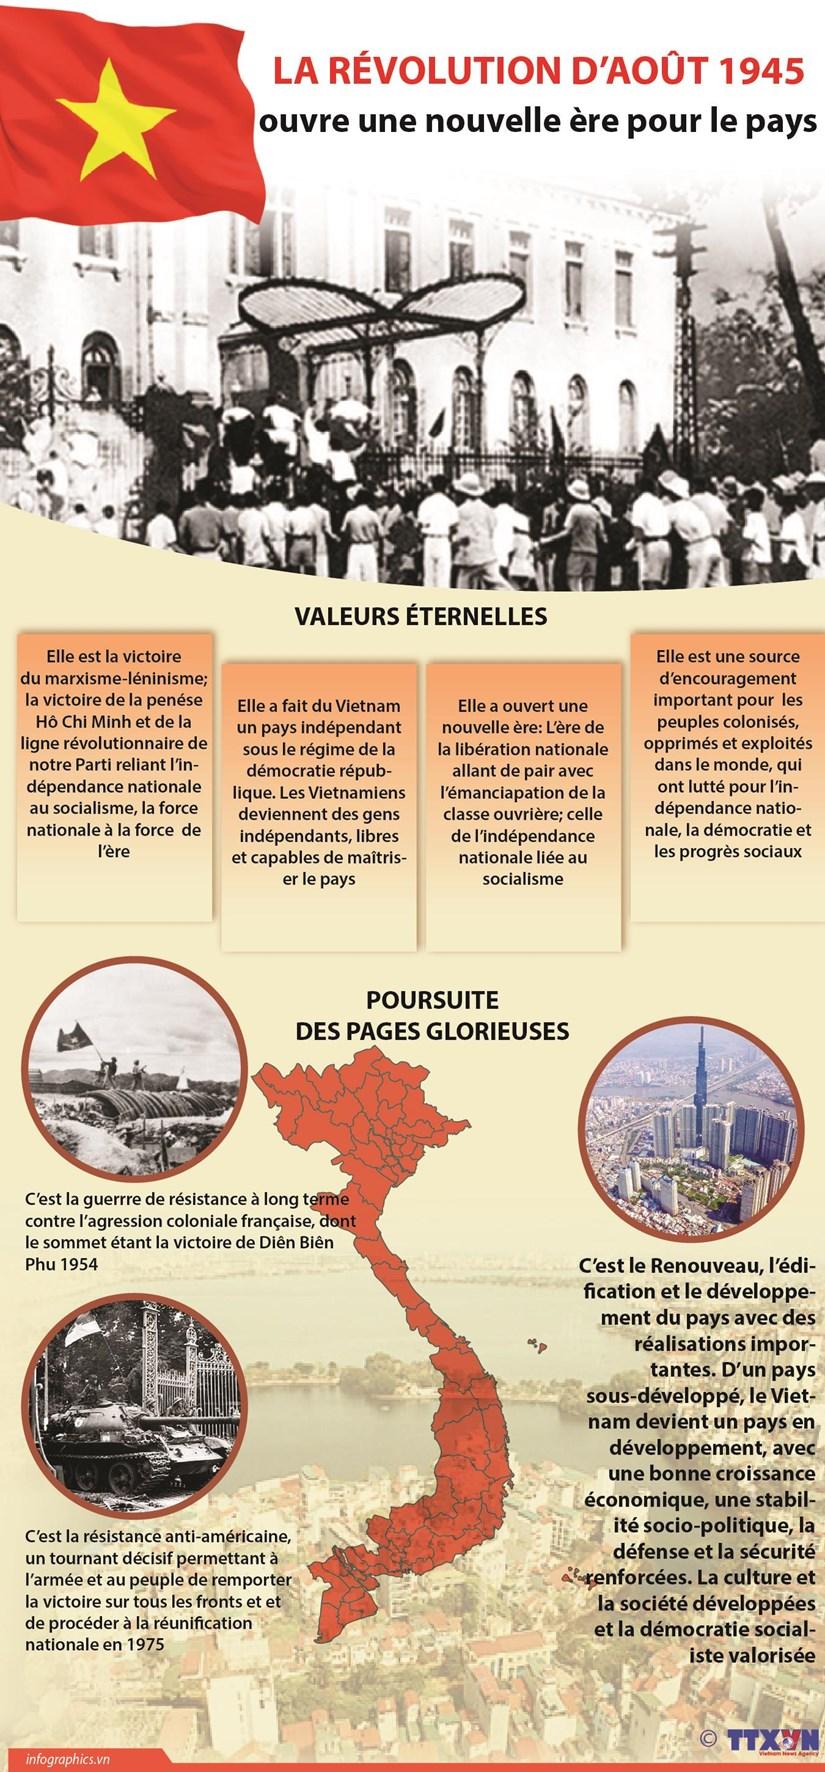 La Revolution d'Aout 1945 hinh anh 1